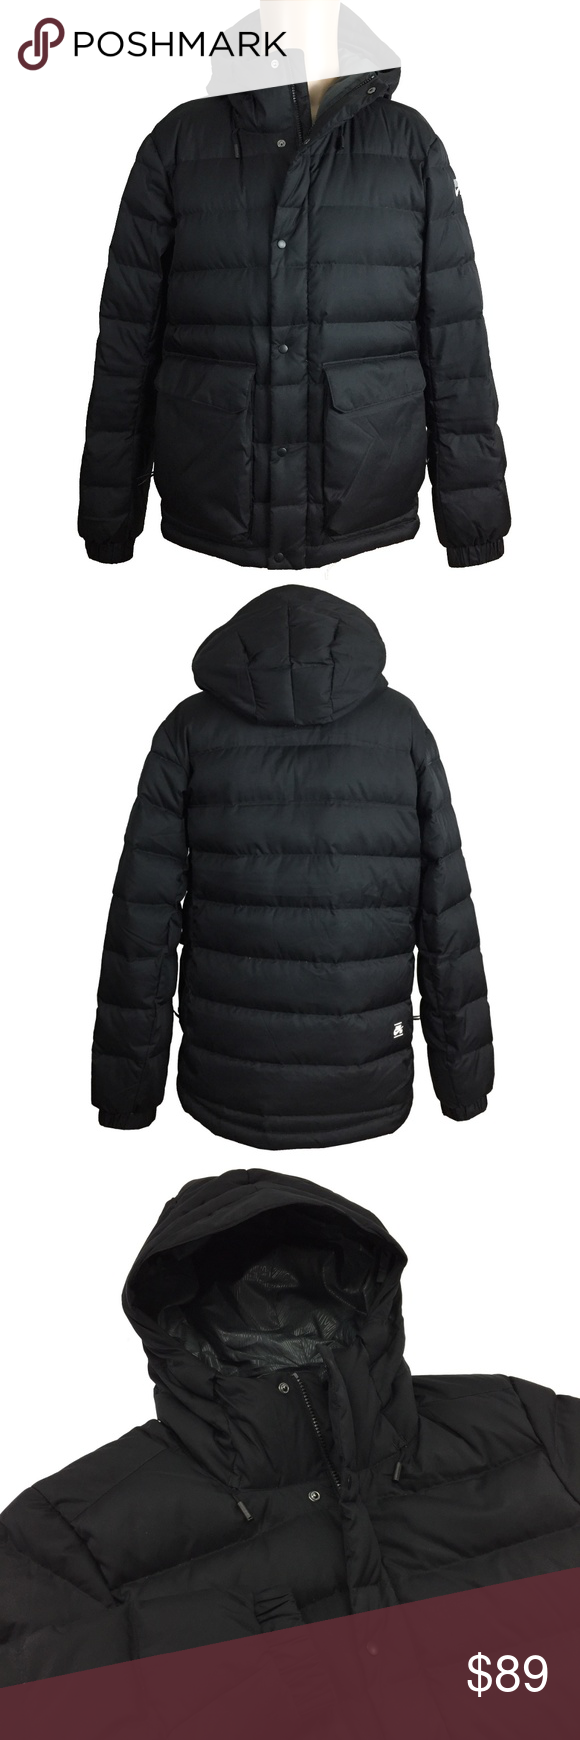 1d332f41bae7 NIKE SB Mens 550 Down Winter Jacket The Nike SB 550 Down Men s Jacket is  made